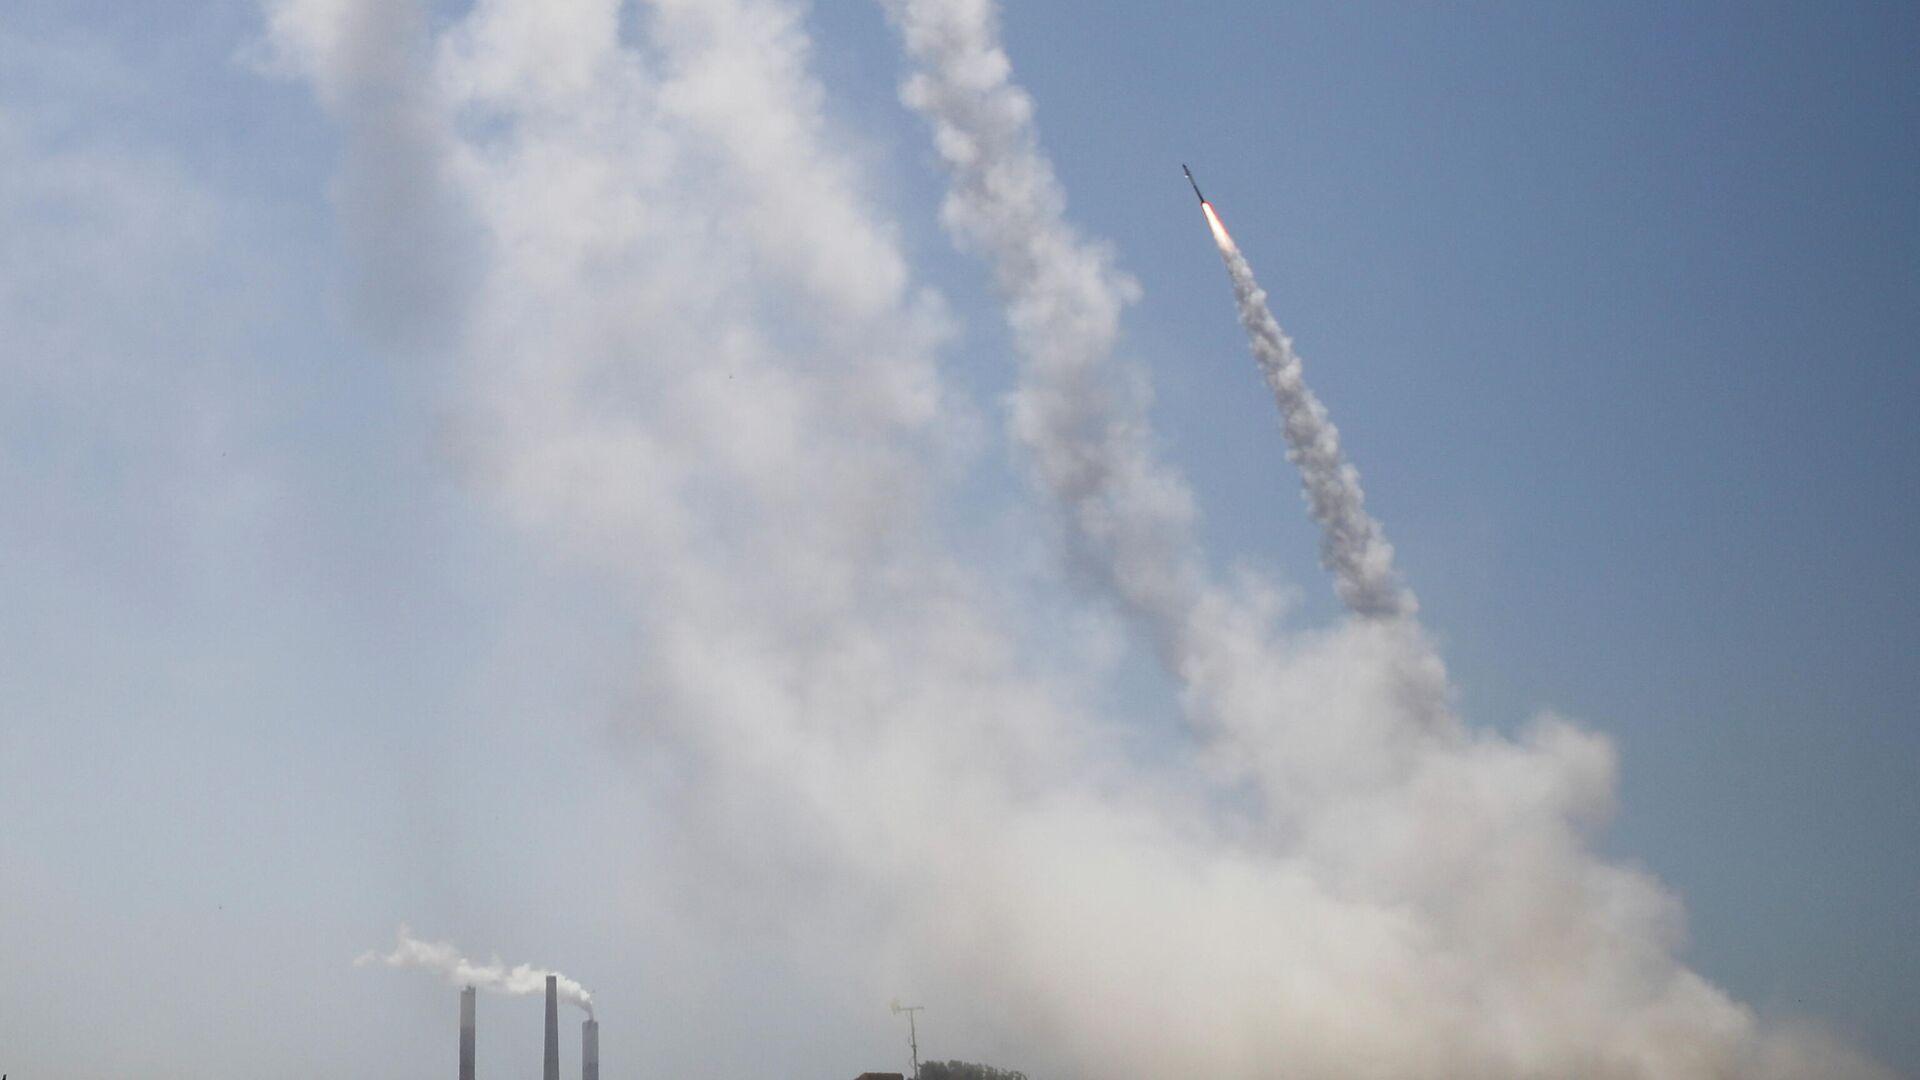 La Cúpula de Hierro israelí intercepta misiles lanzados desde Gaza - Sputnik Mundo, 1920, 11.05.2021